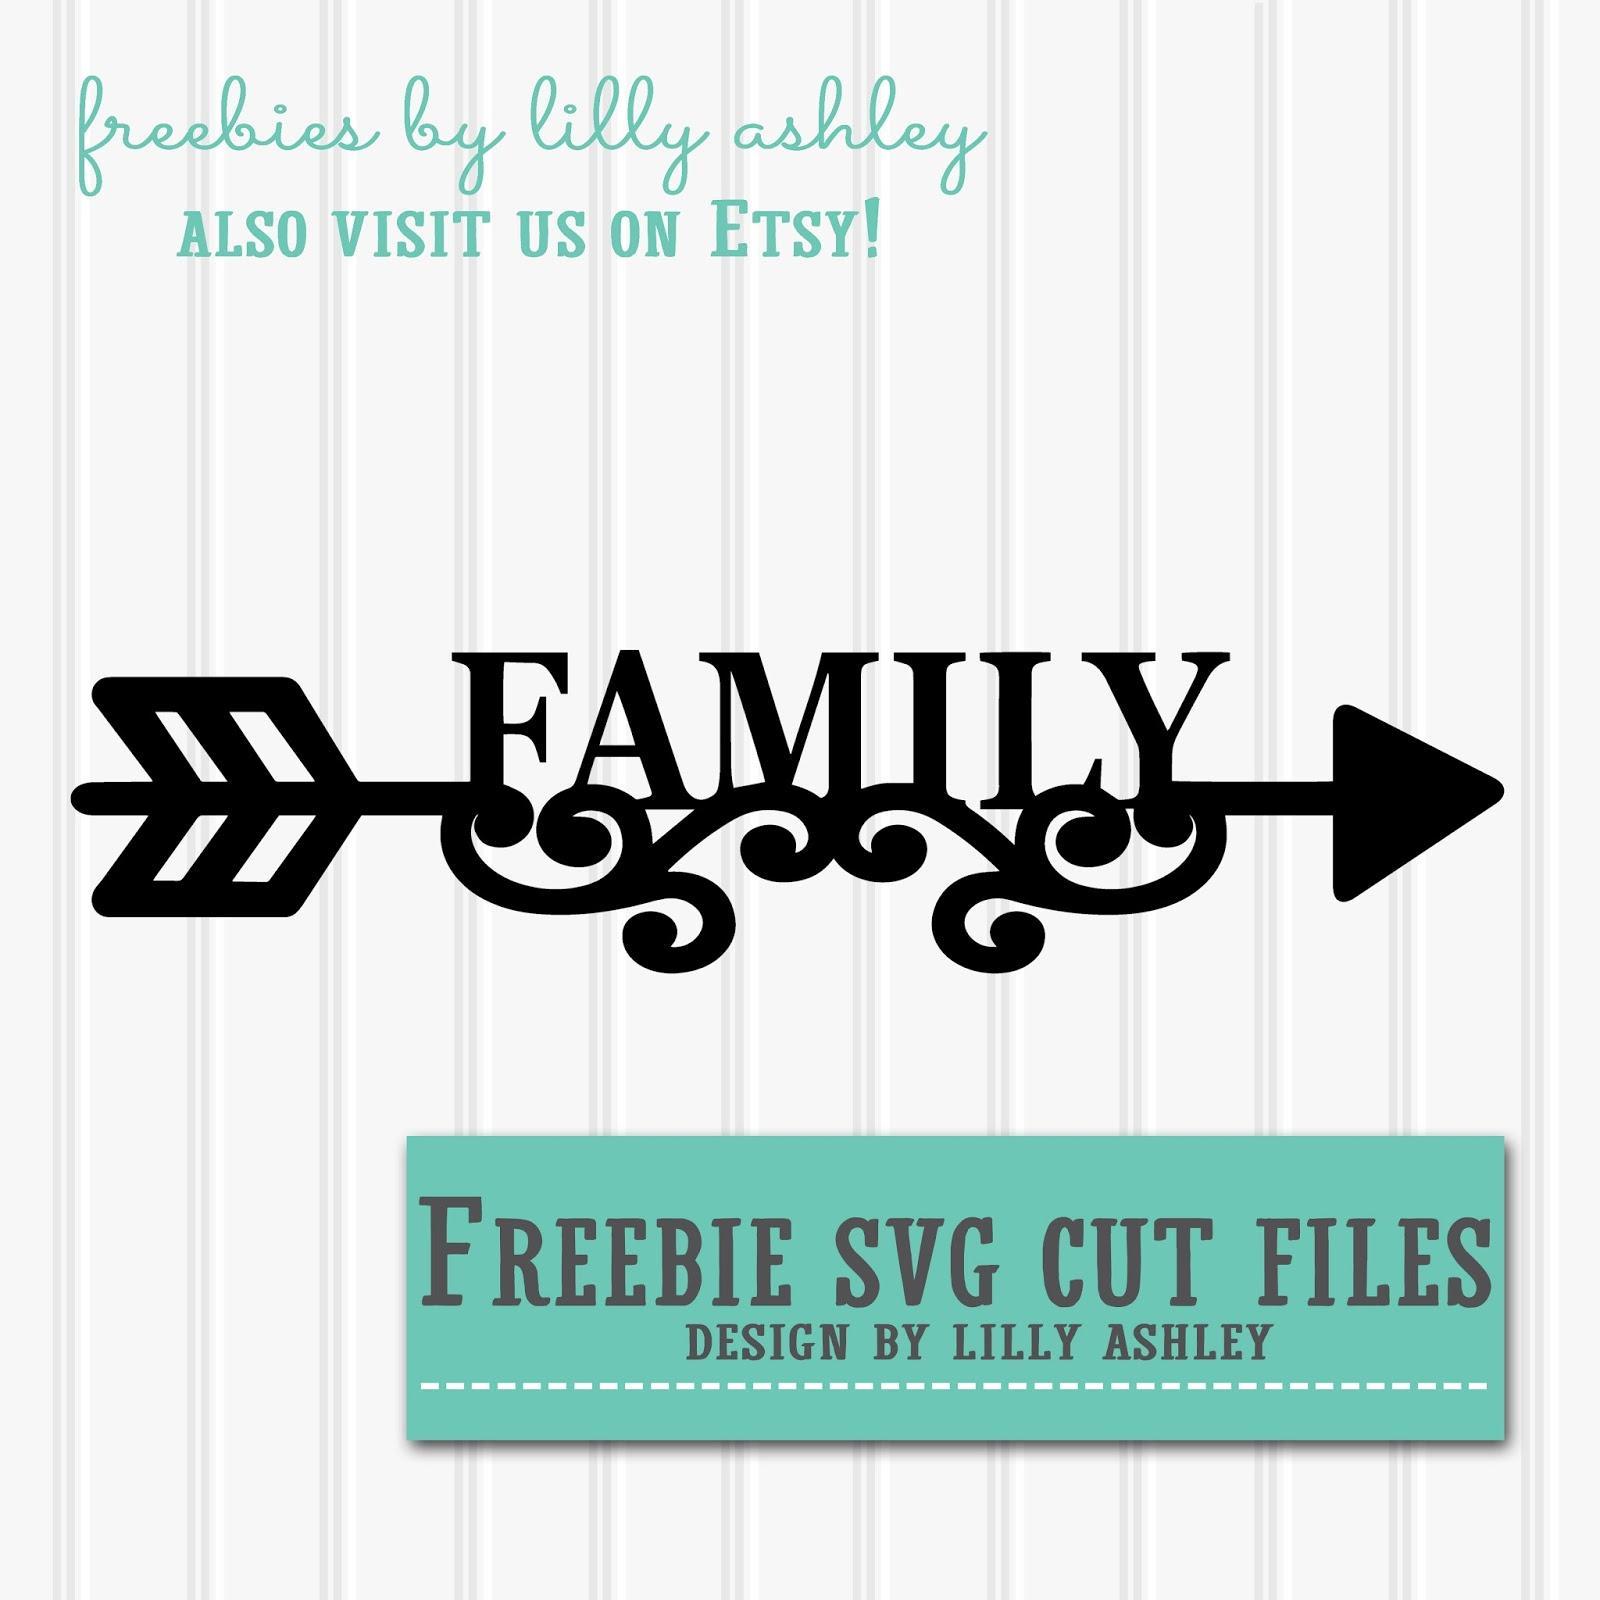 Download freebies free